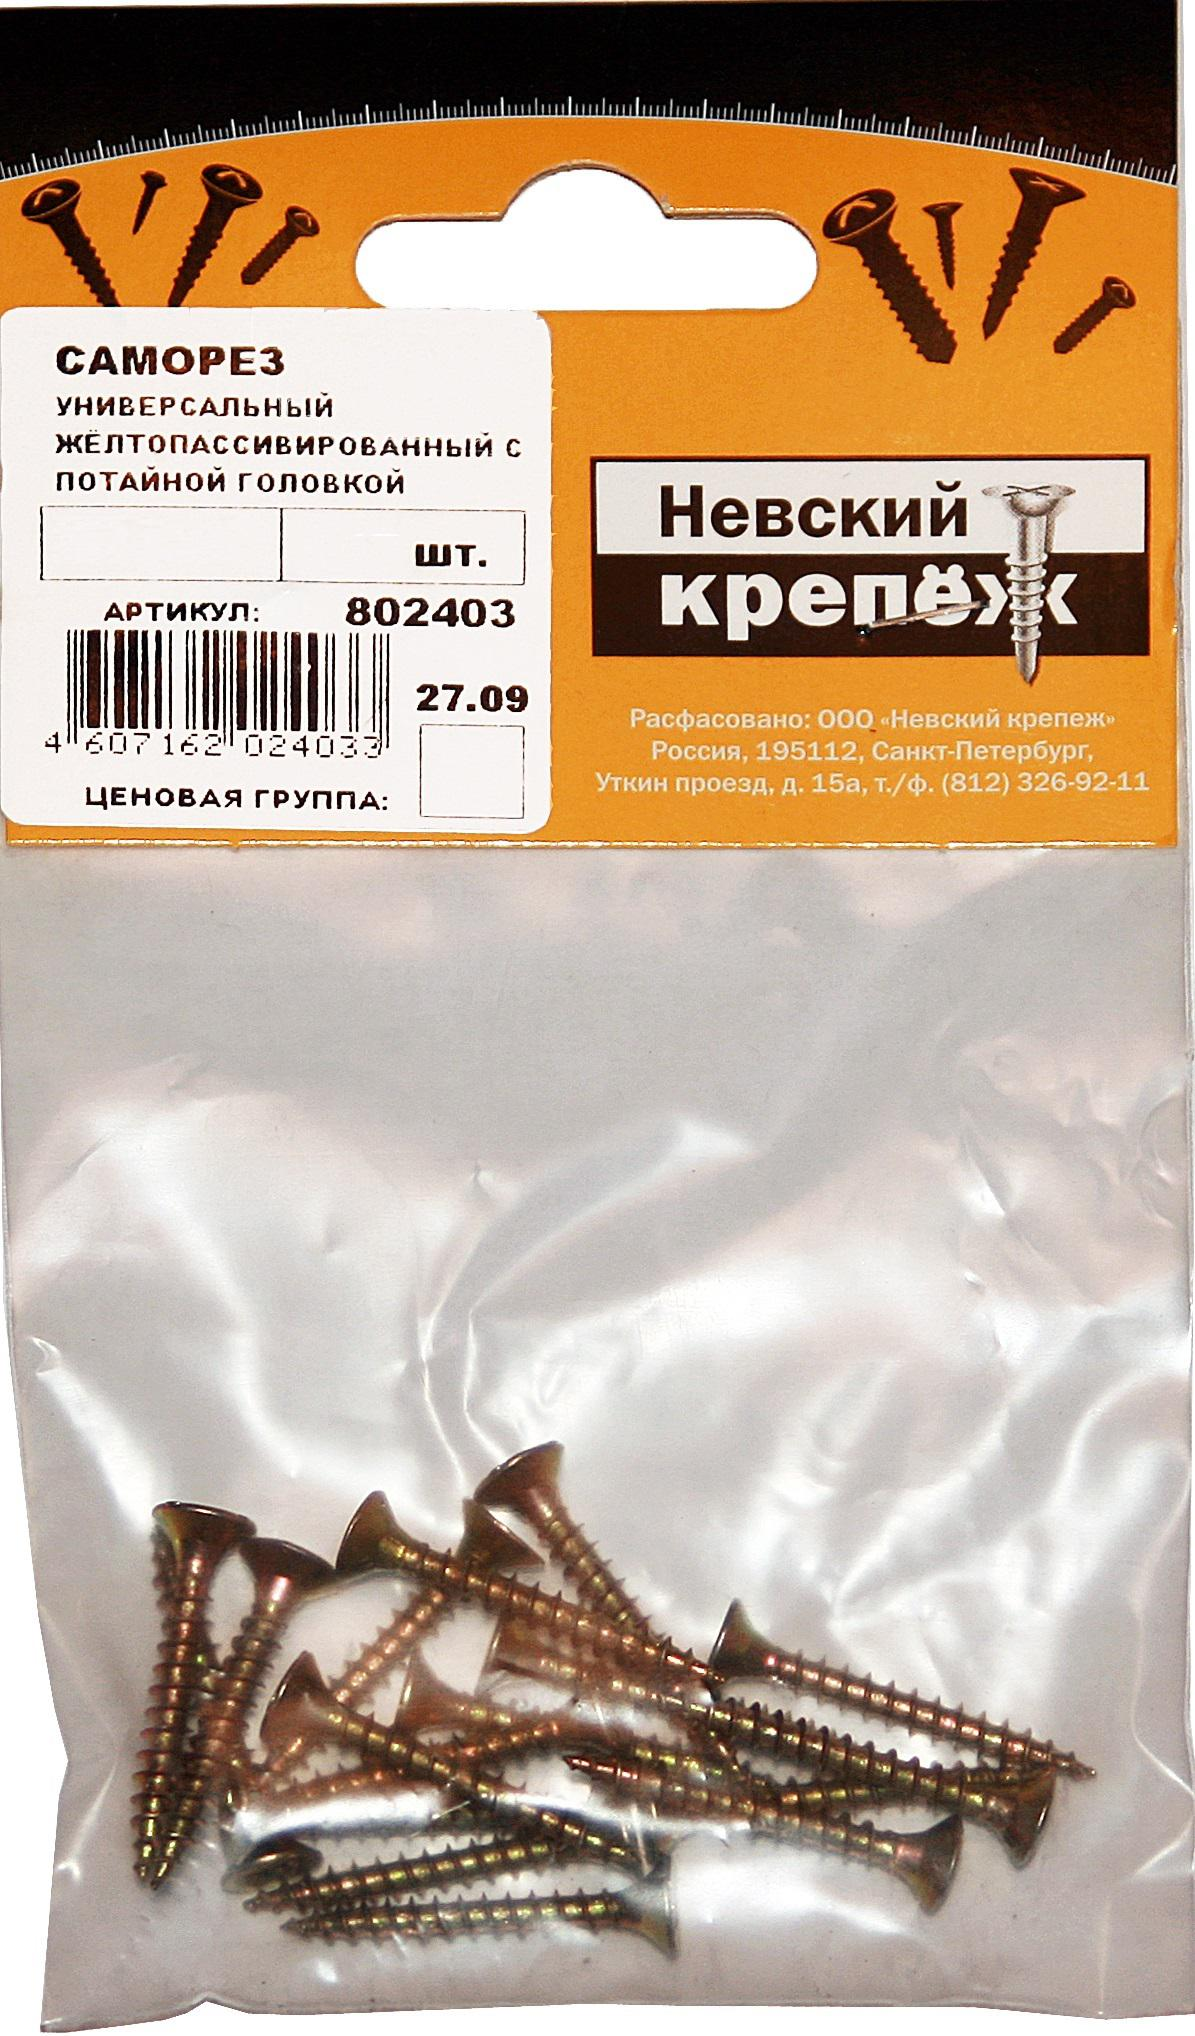 Саморез НЕВСКИЙ КРЕПЕЖ 802402